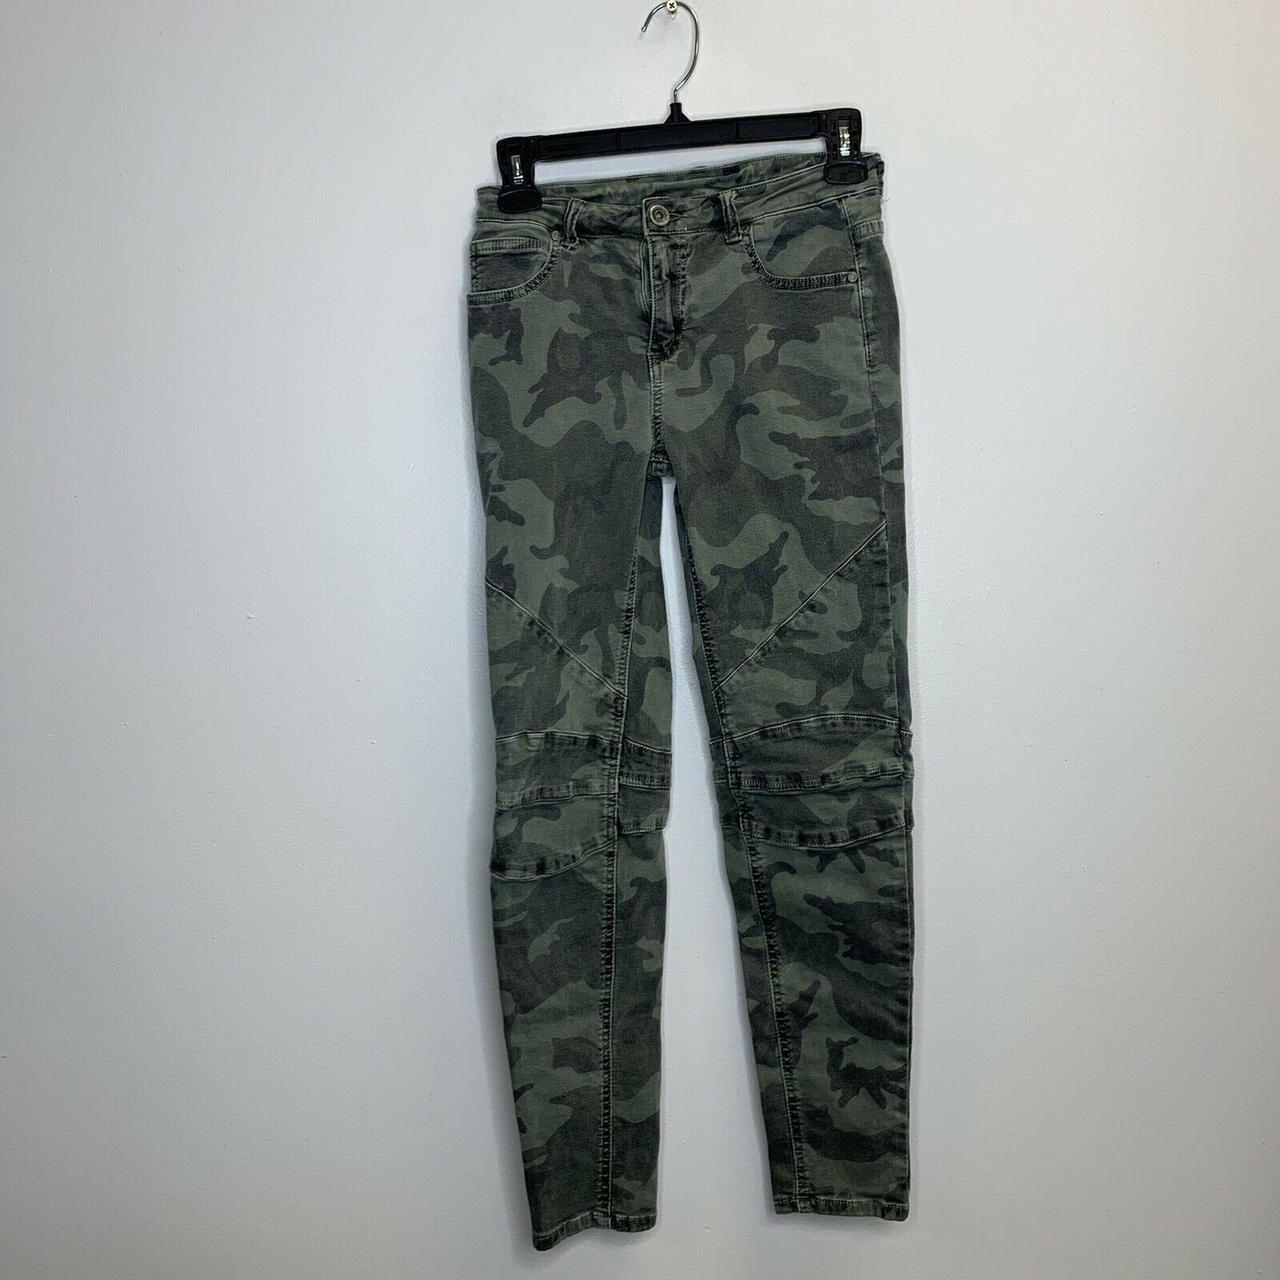 Product Image 1 - Six Denim Womens Camo Jeans